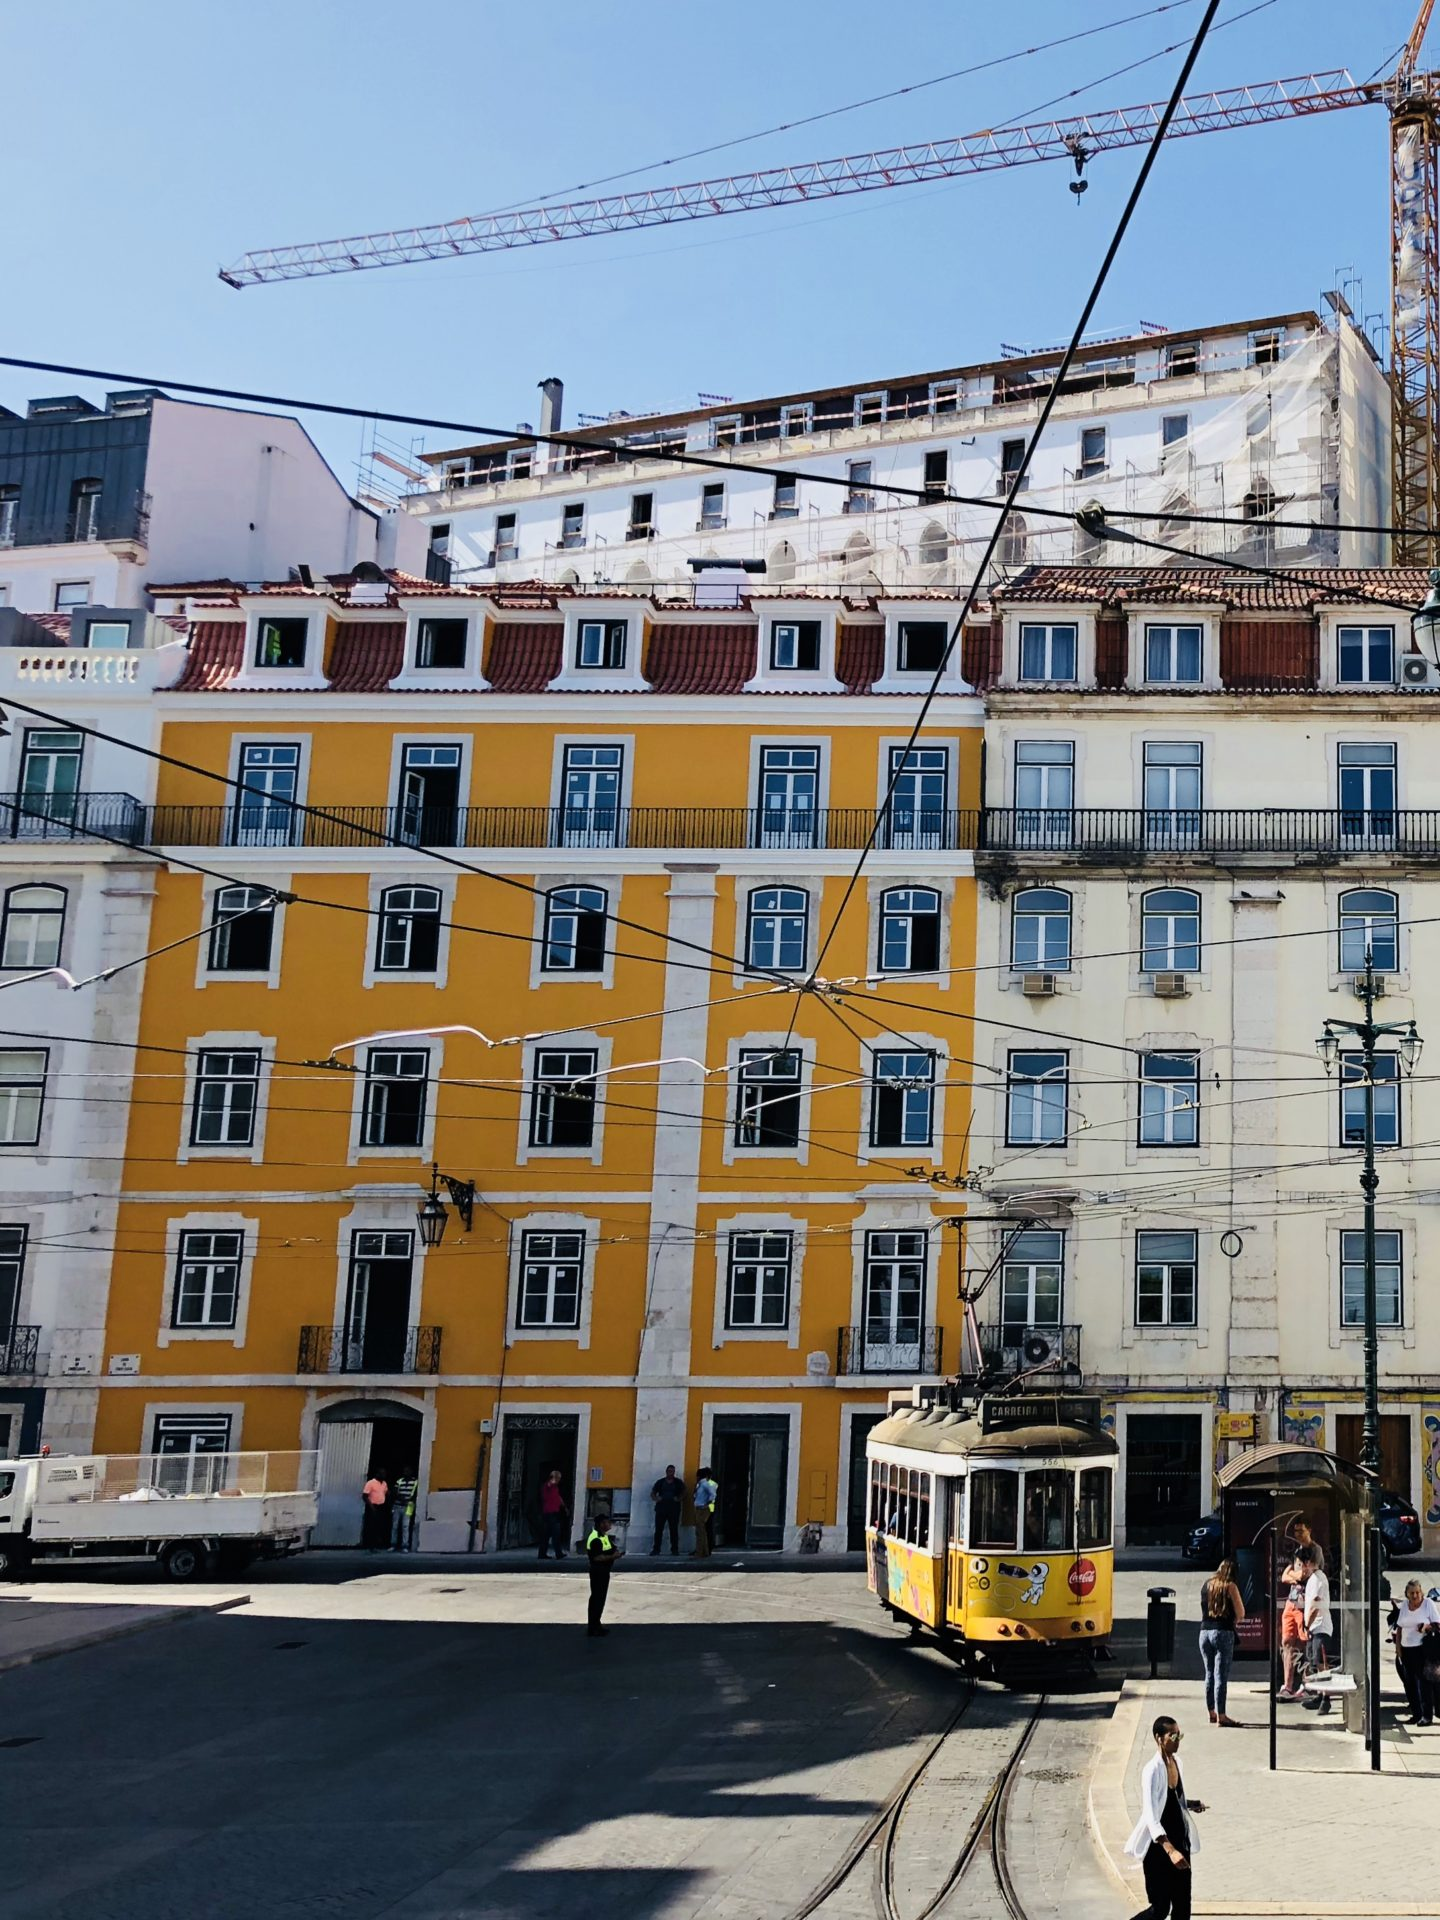 casie stewart, portugal, aeroplan, withaeroplan, lisboa, lisbon, travel brogger, influencer, casiestewart